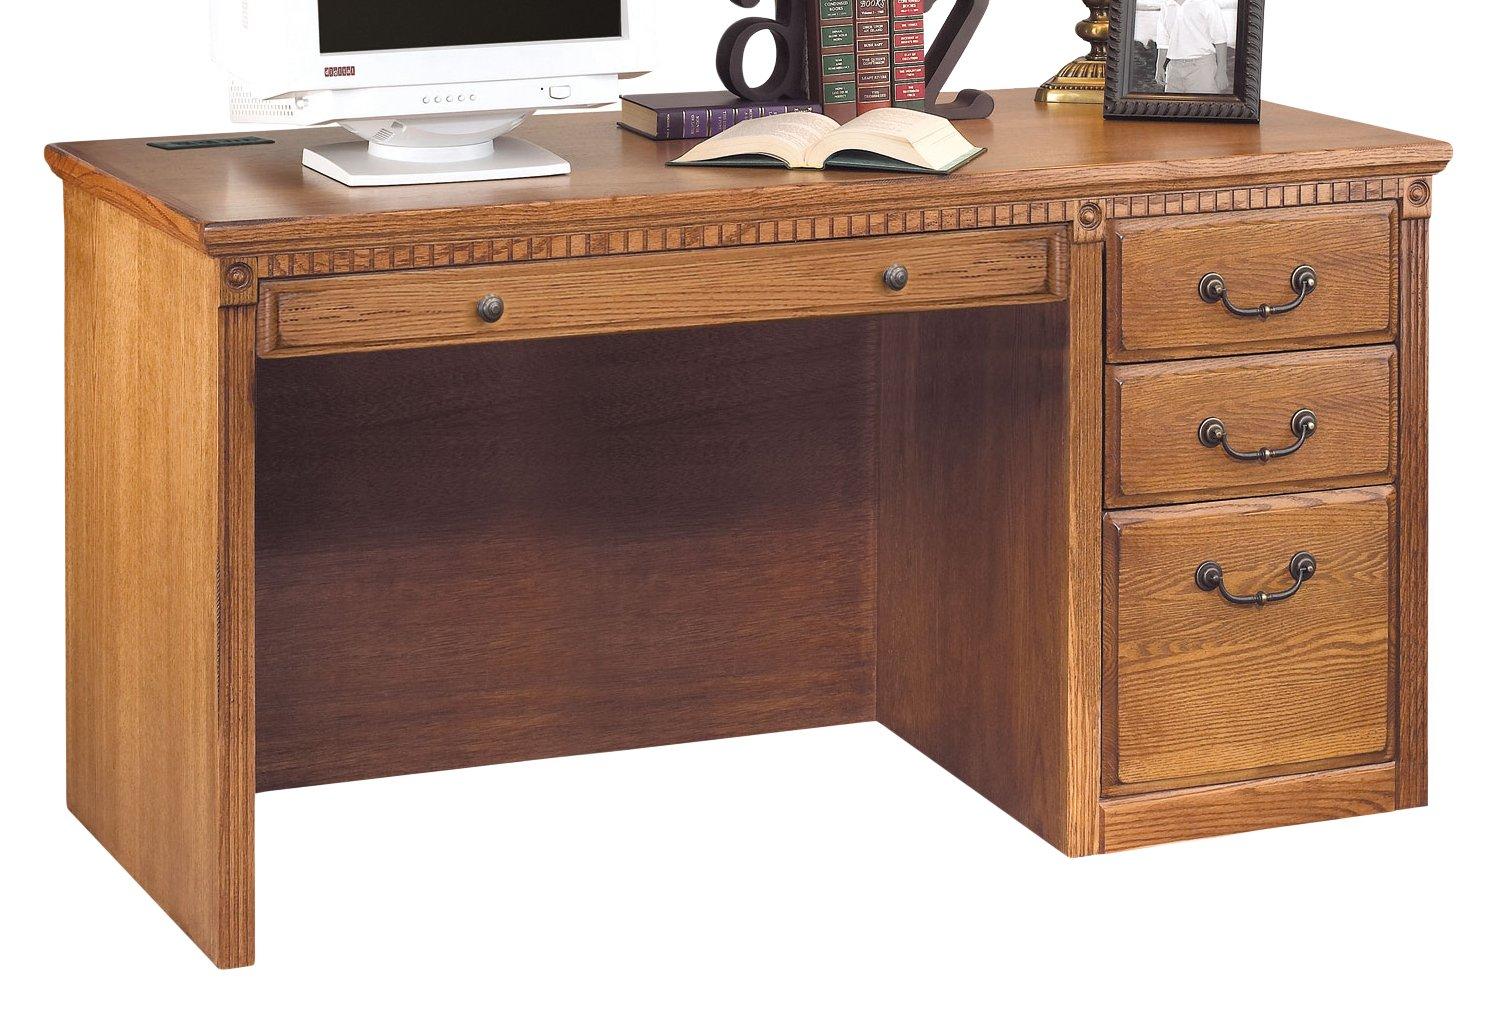 Martin Furniture Huntington Oxford Single Pedestal Computer Desk, Wheat Finish, Fully Assembled